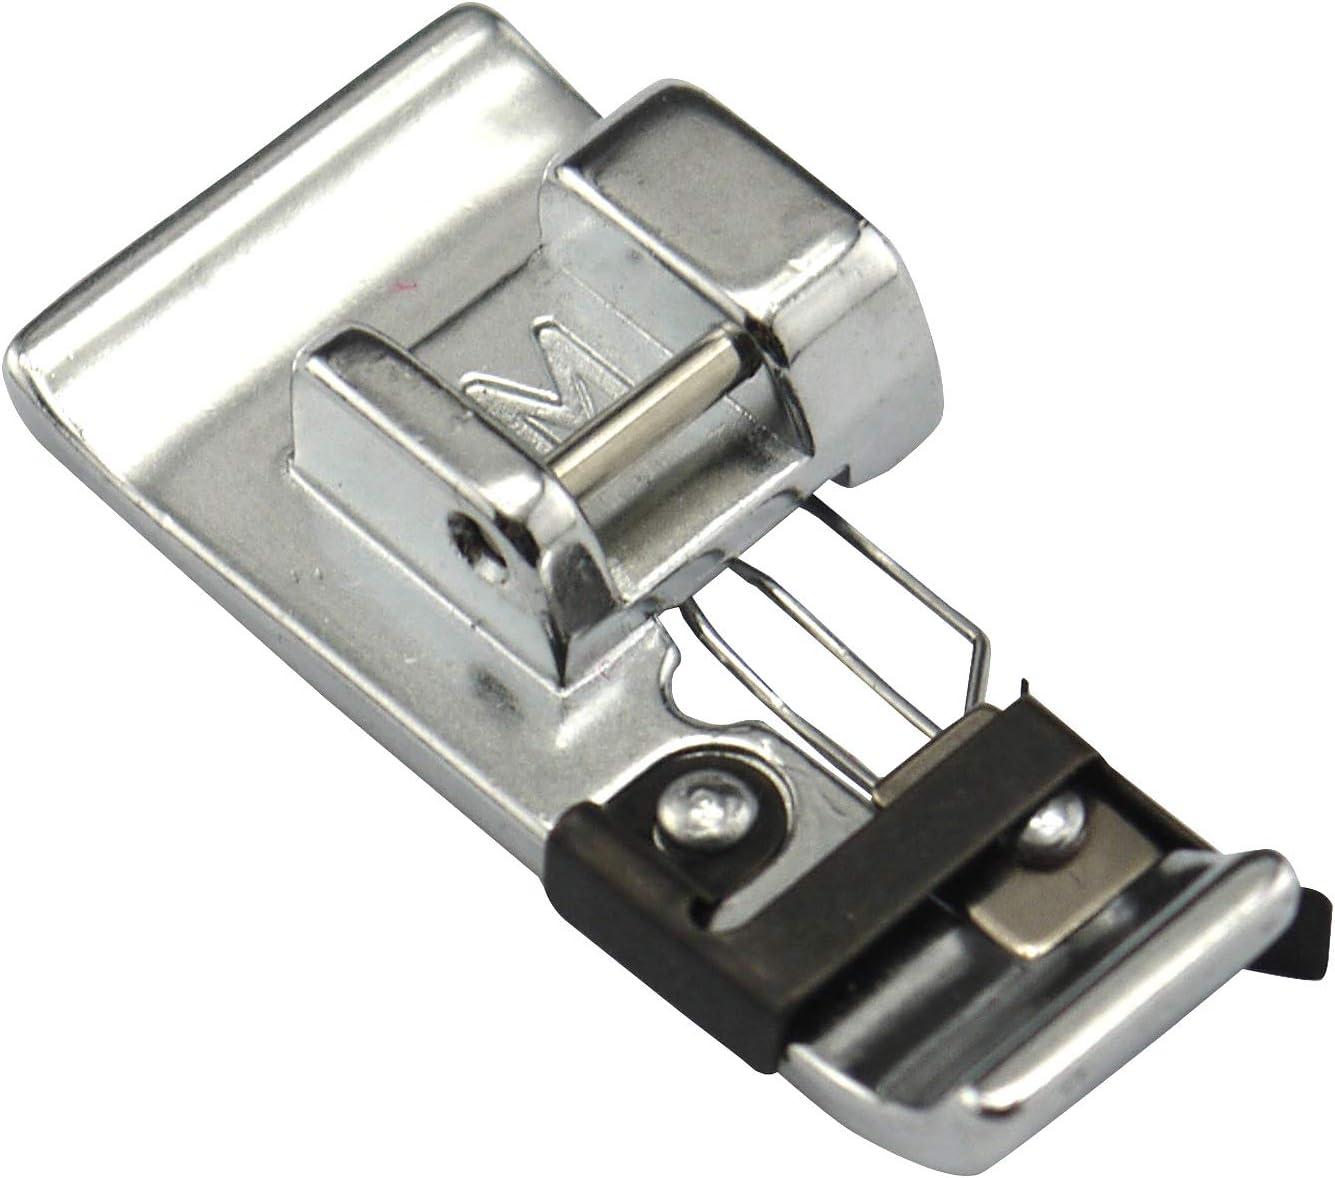 DREAMSTITCH 822808008 Prensatelas para máquina de coser Elna, Janome, Kenmore, Necchi, Viking 395719-47 822808008: Amazon.es: Hogar